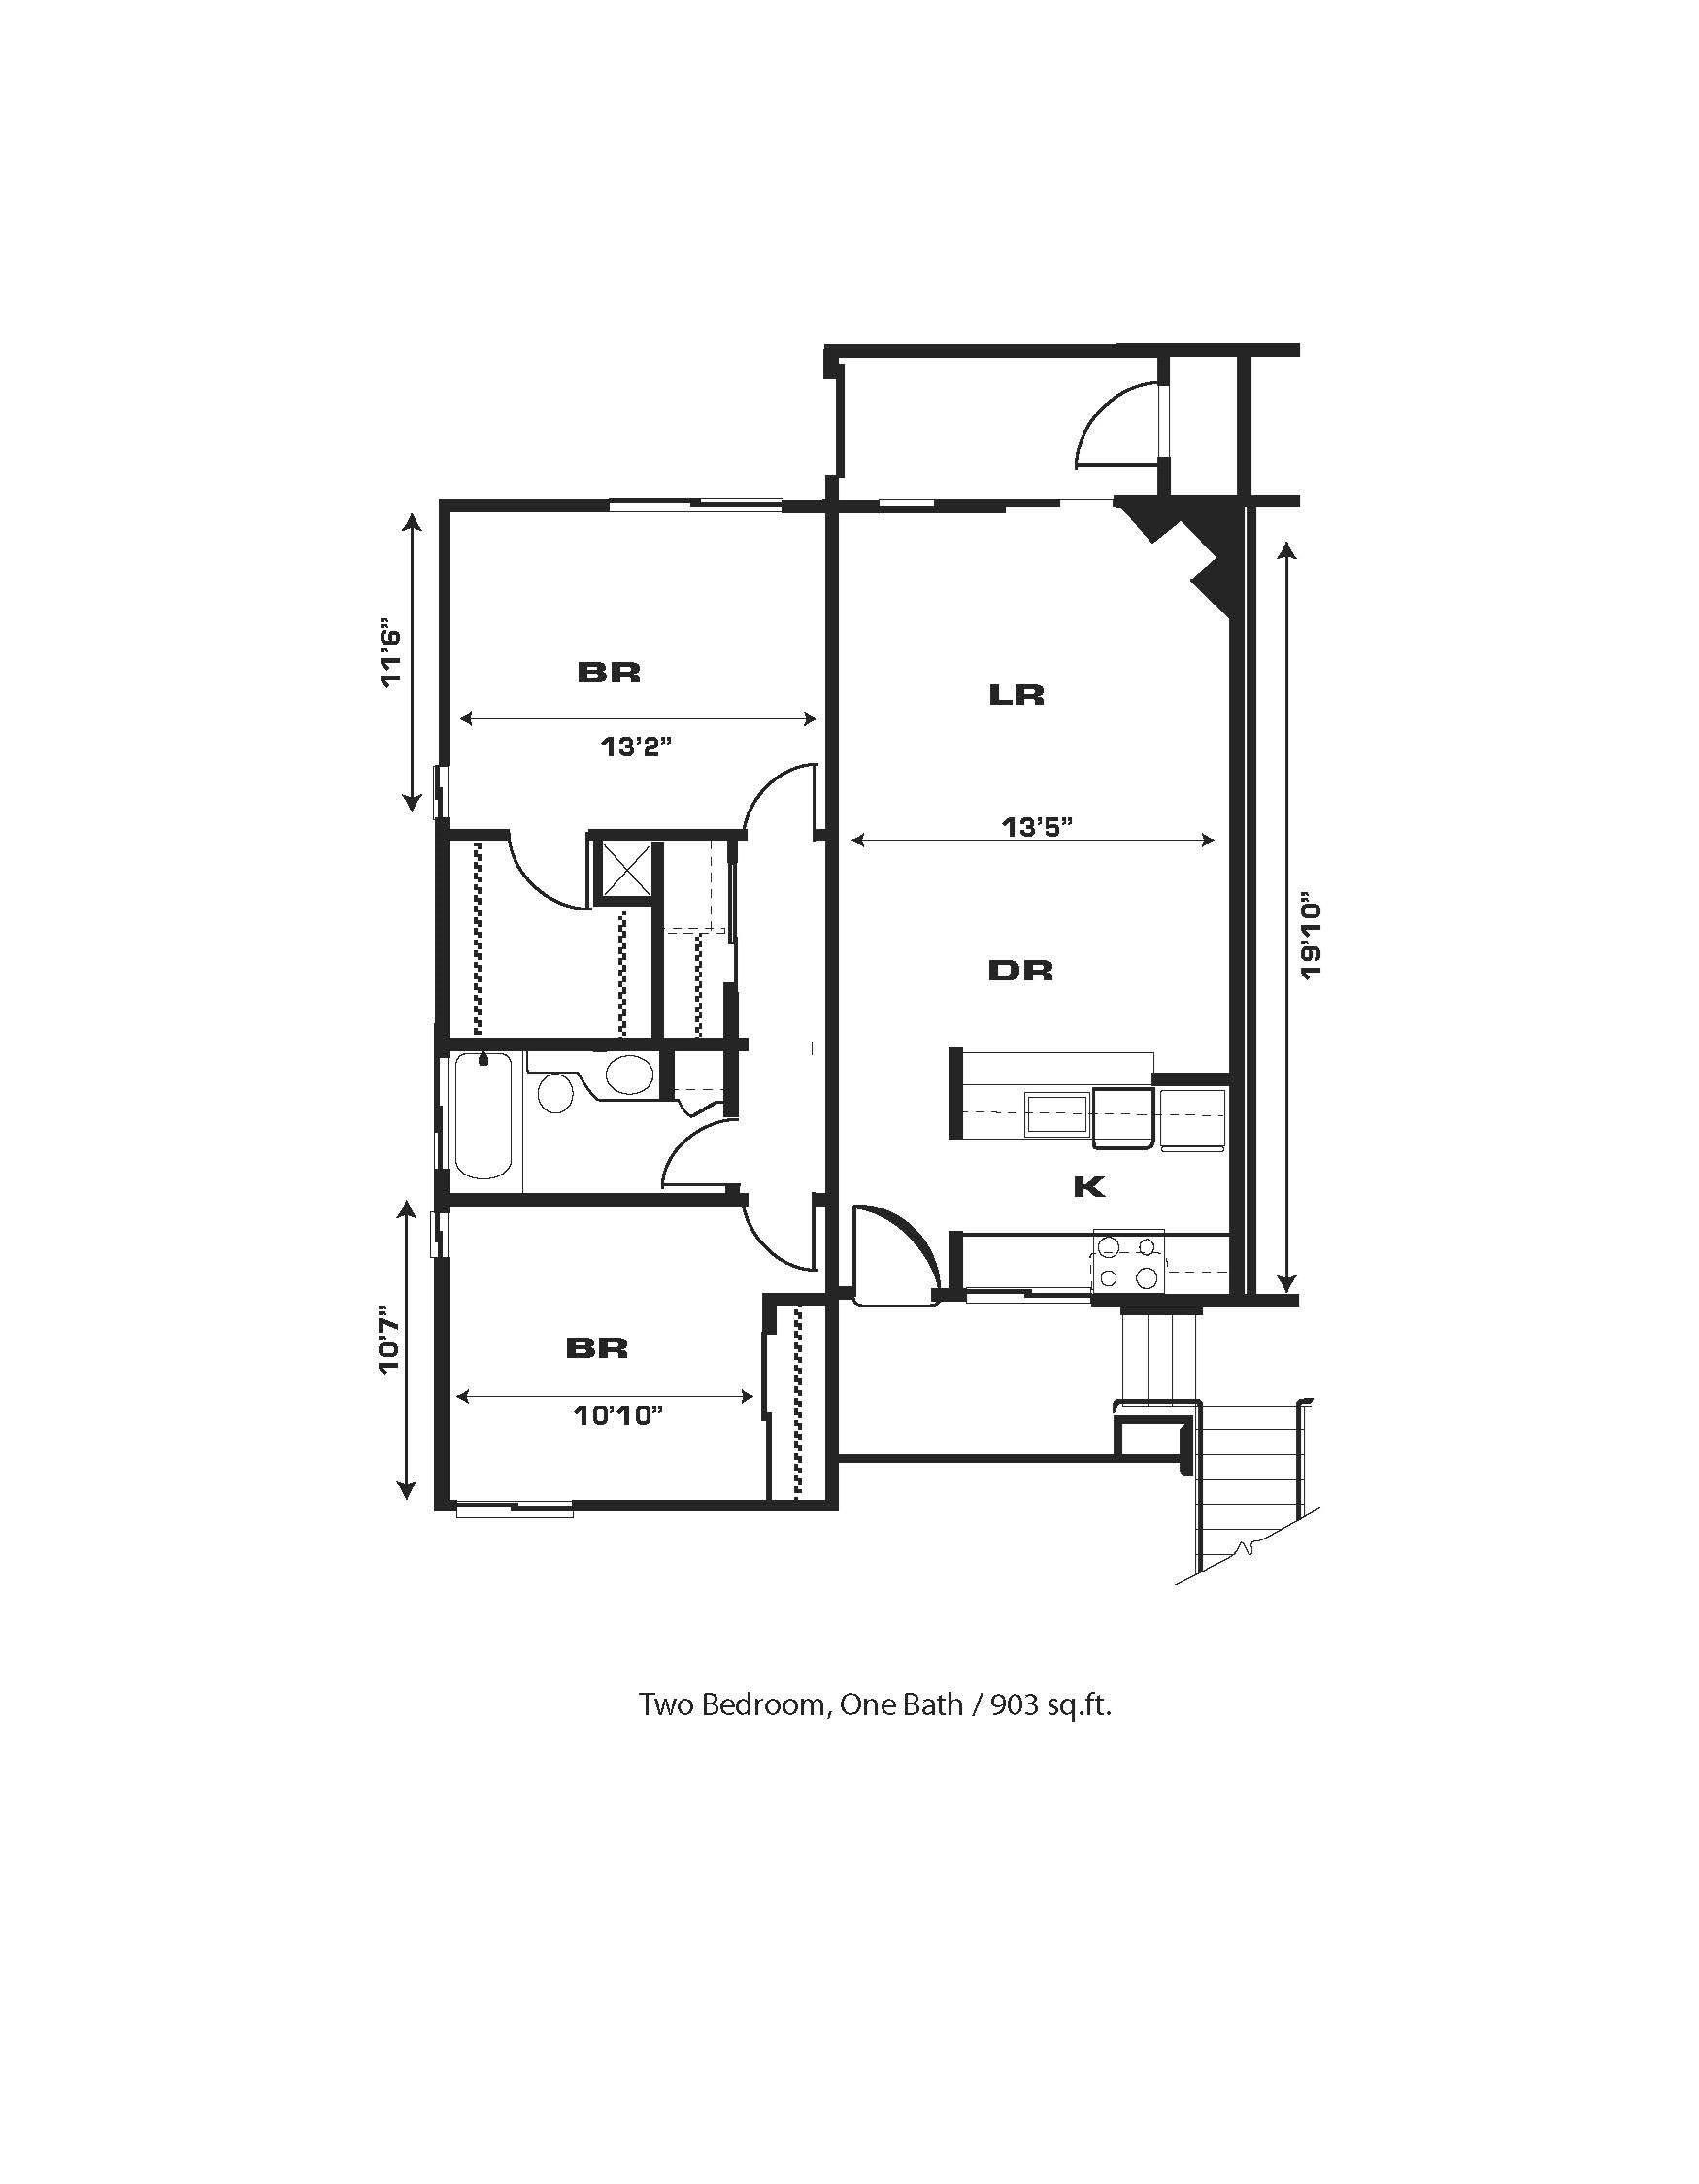 2br/1ba, Fireplace, End Unit Floor Plan 8